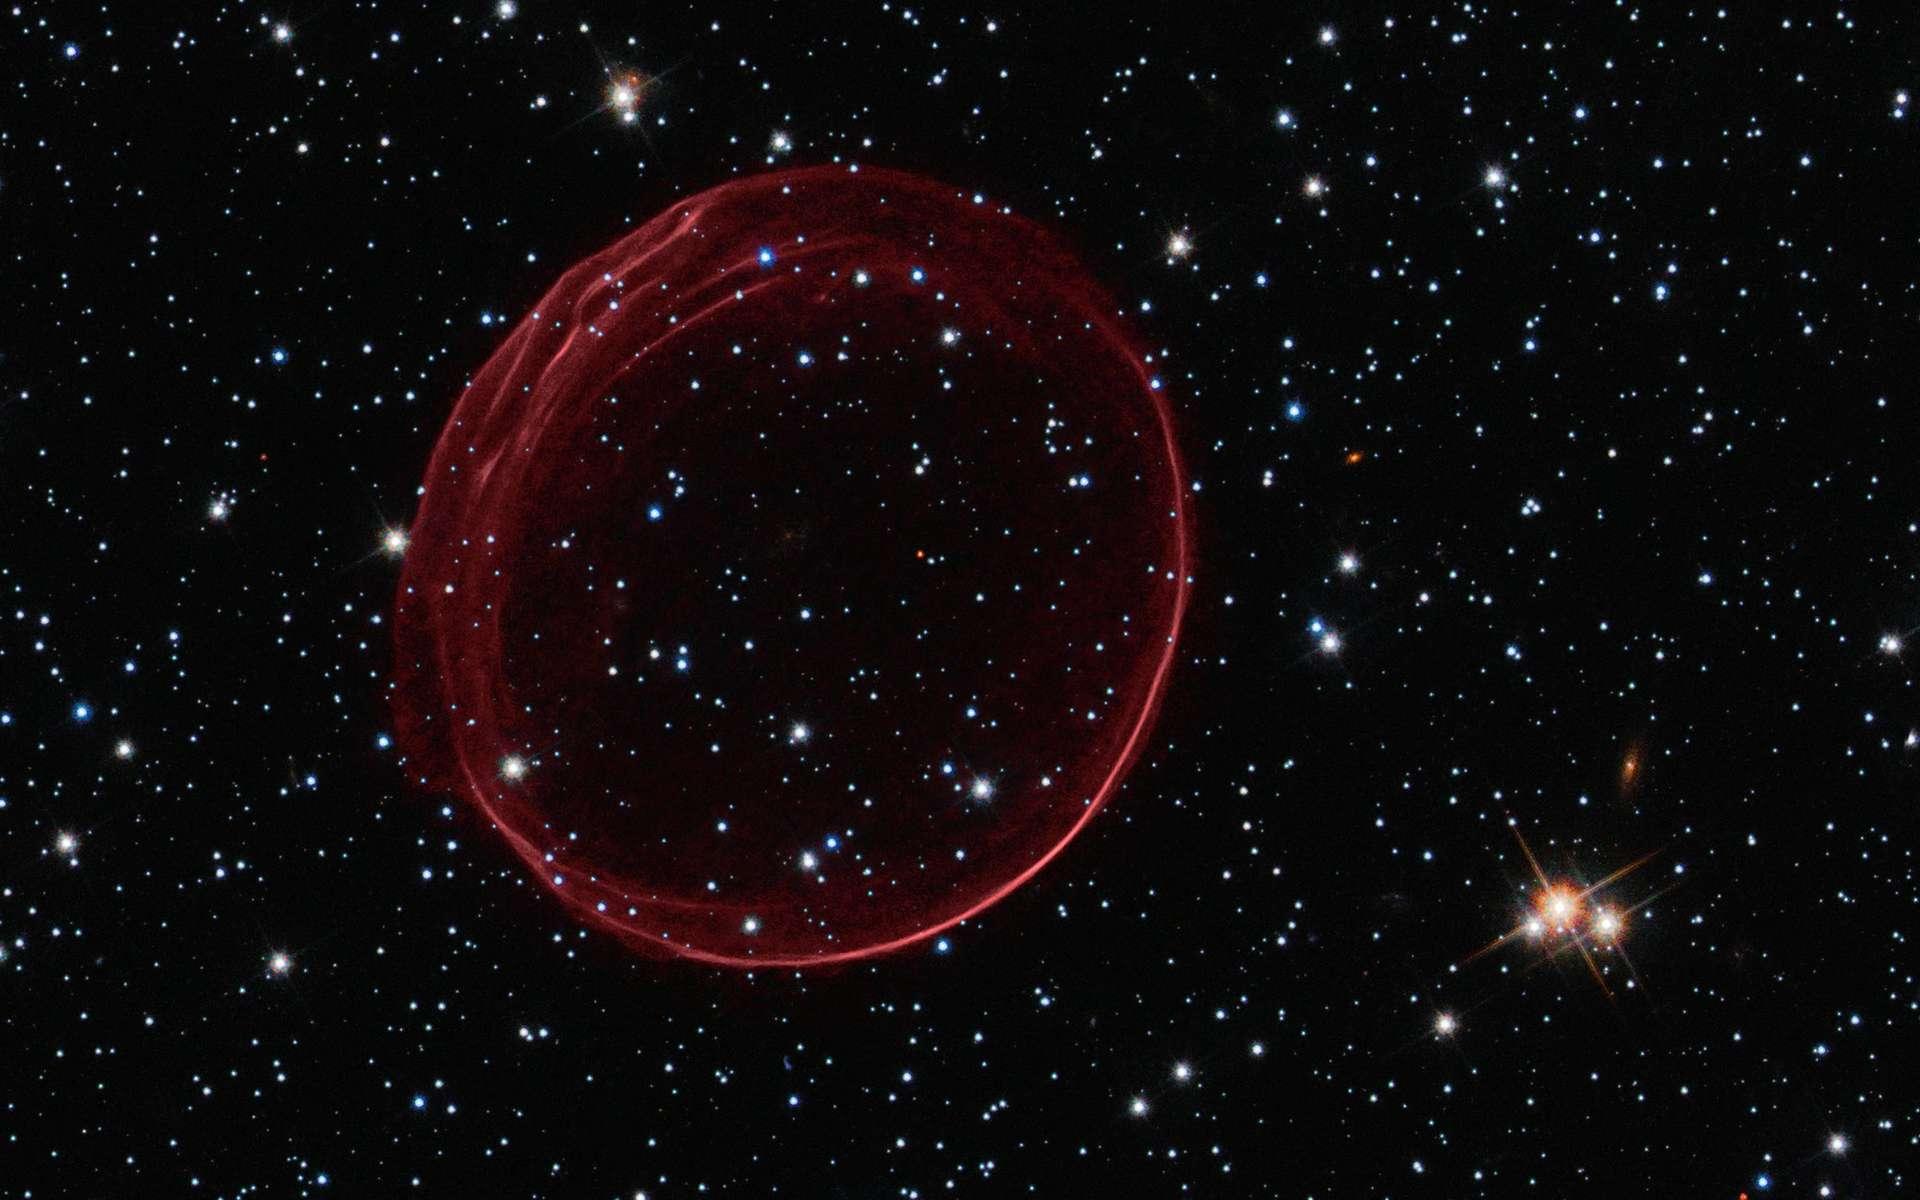 SNR 0509, le cadeau de Noël du télescope Hubble. © Nasa/Esa/The Hubble Heritage Team (STScI/AURA)/J. Hughes (Rutgers University)